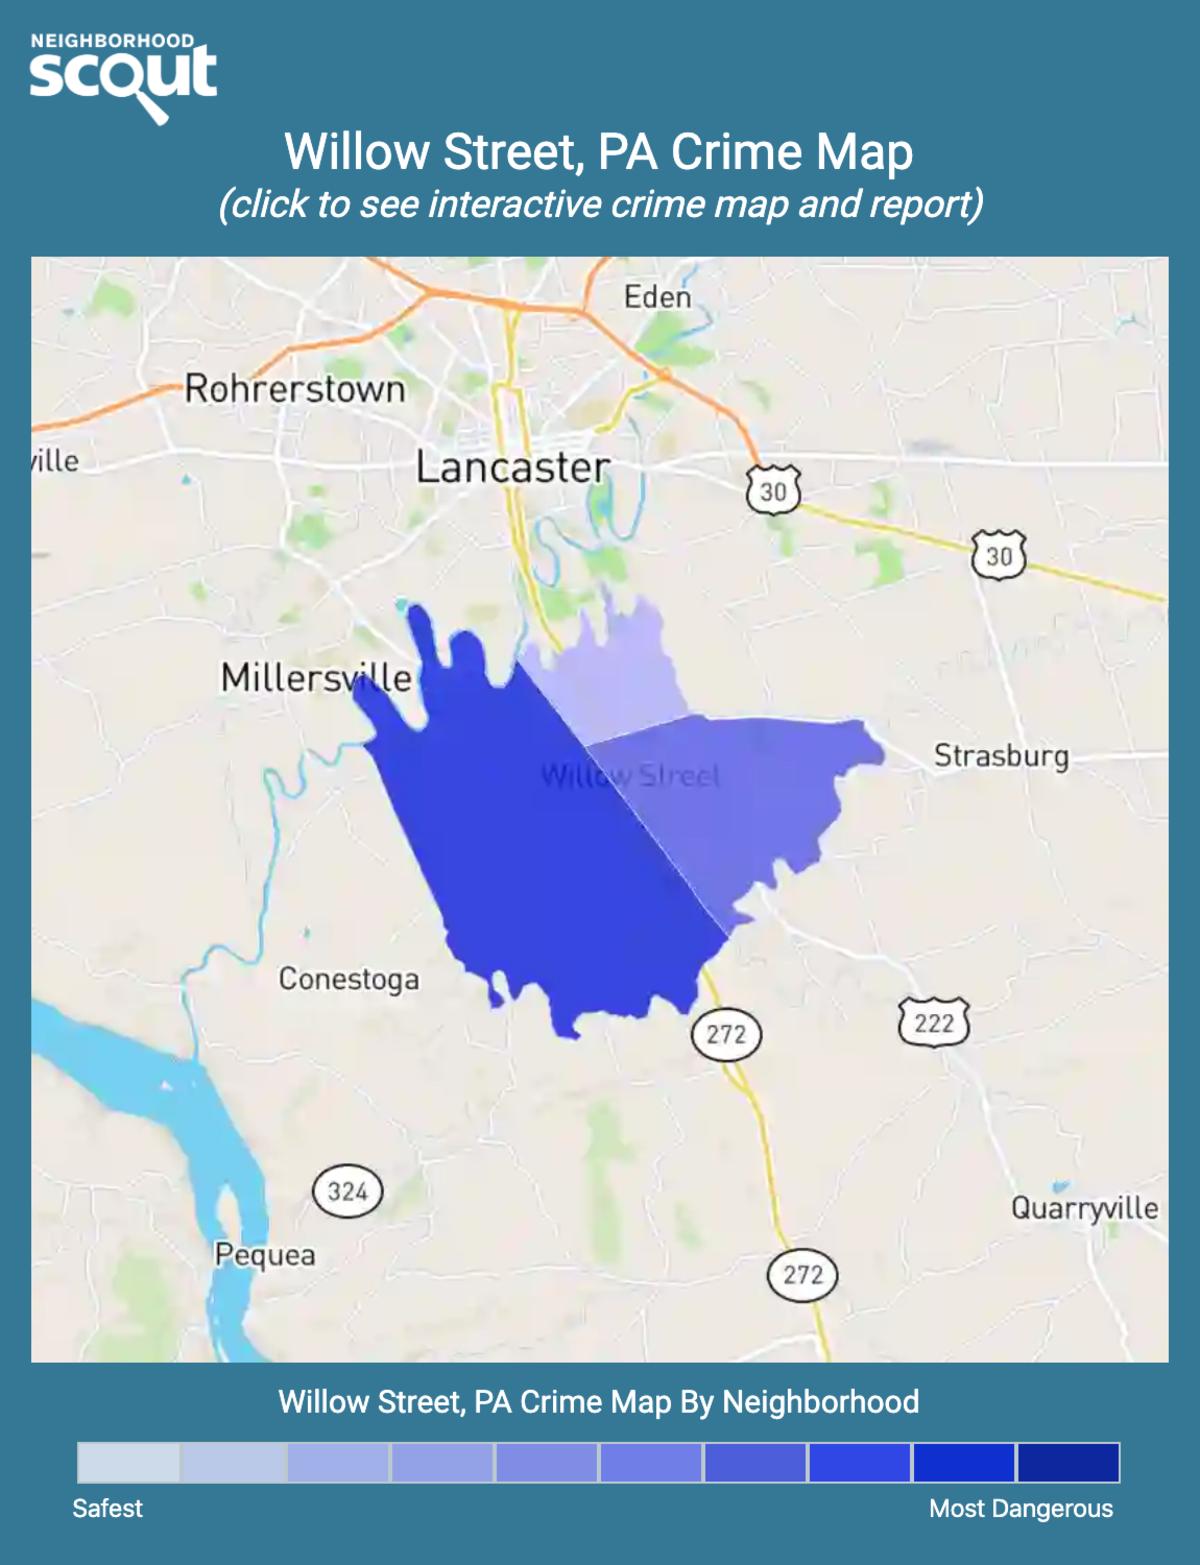 Willow Street, Pennsylvania crime map